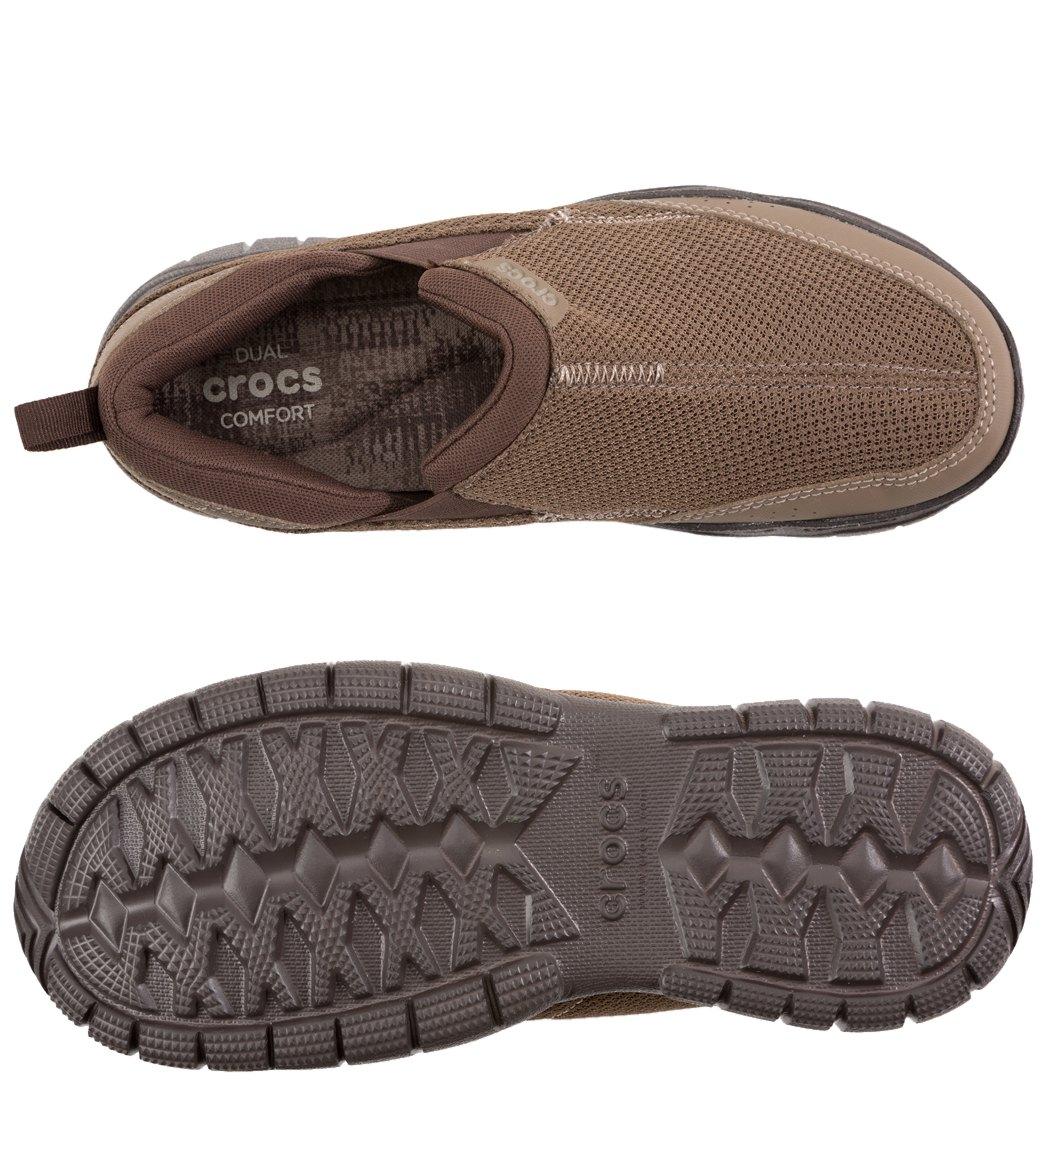 b2117a2fb8c0 Crocs Men s Swiftwater Mesh Moc Slip On at SwimOutlet.com - Free ...